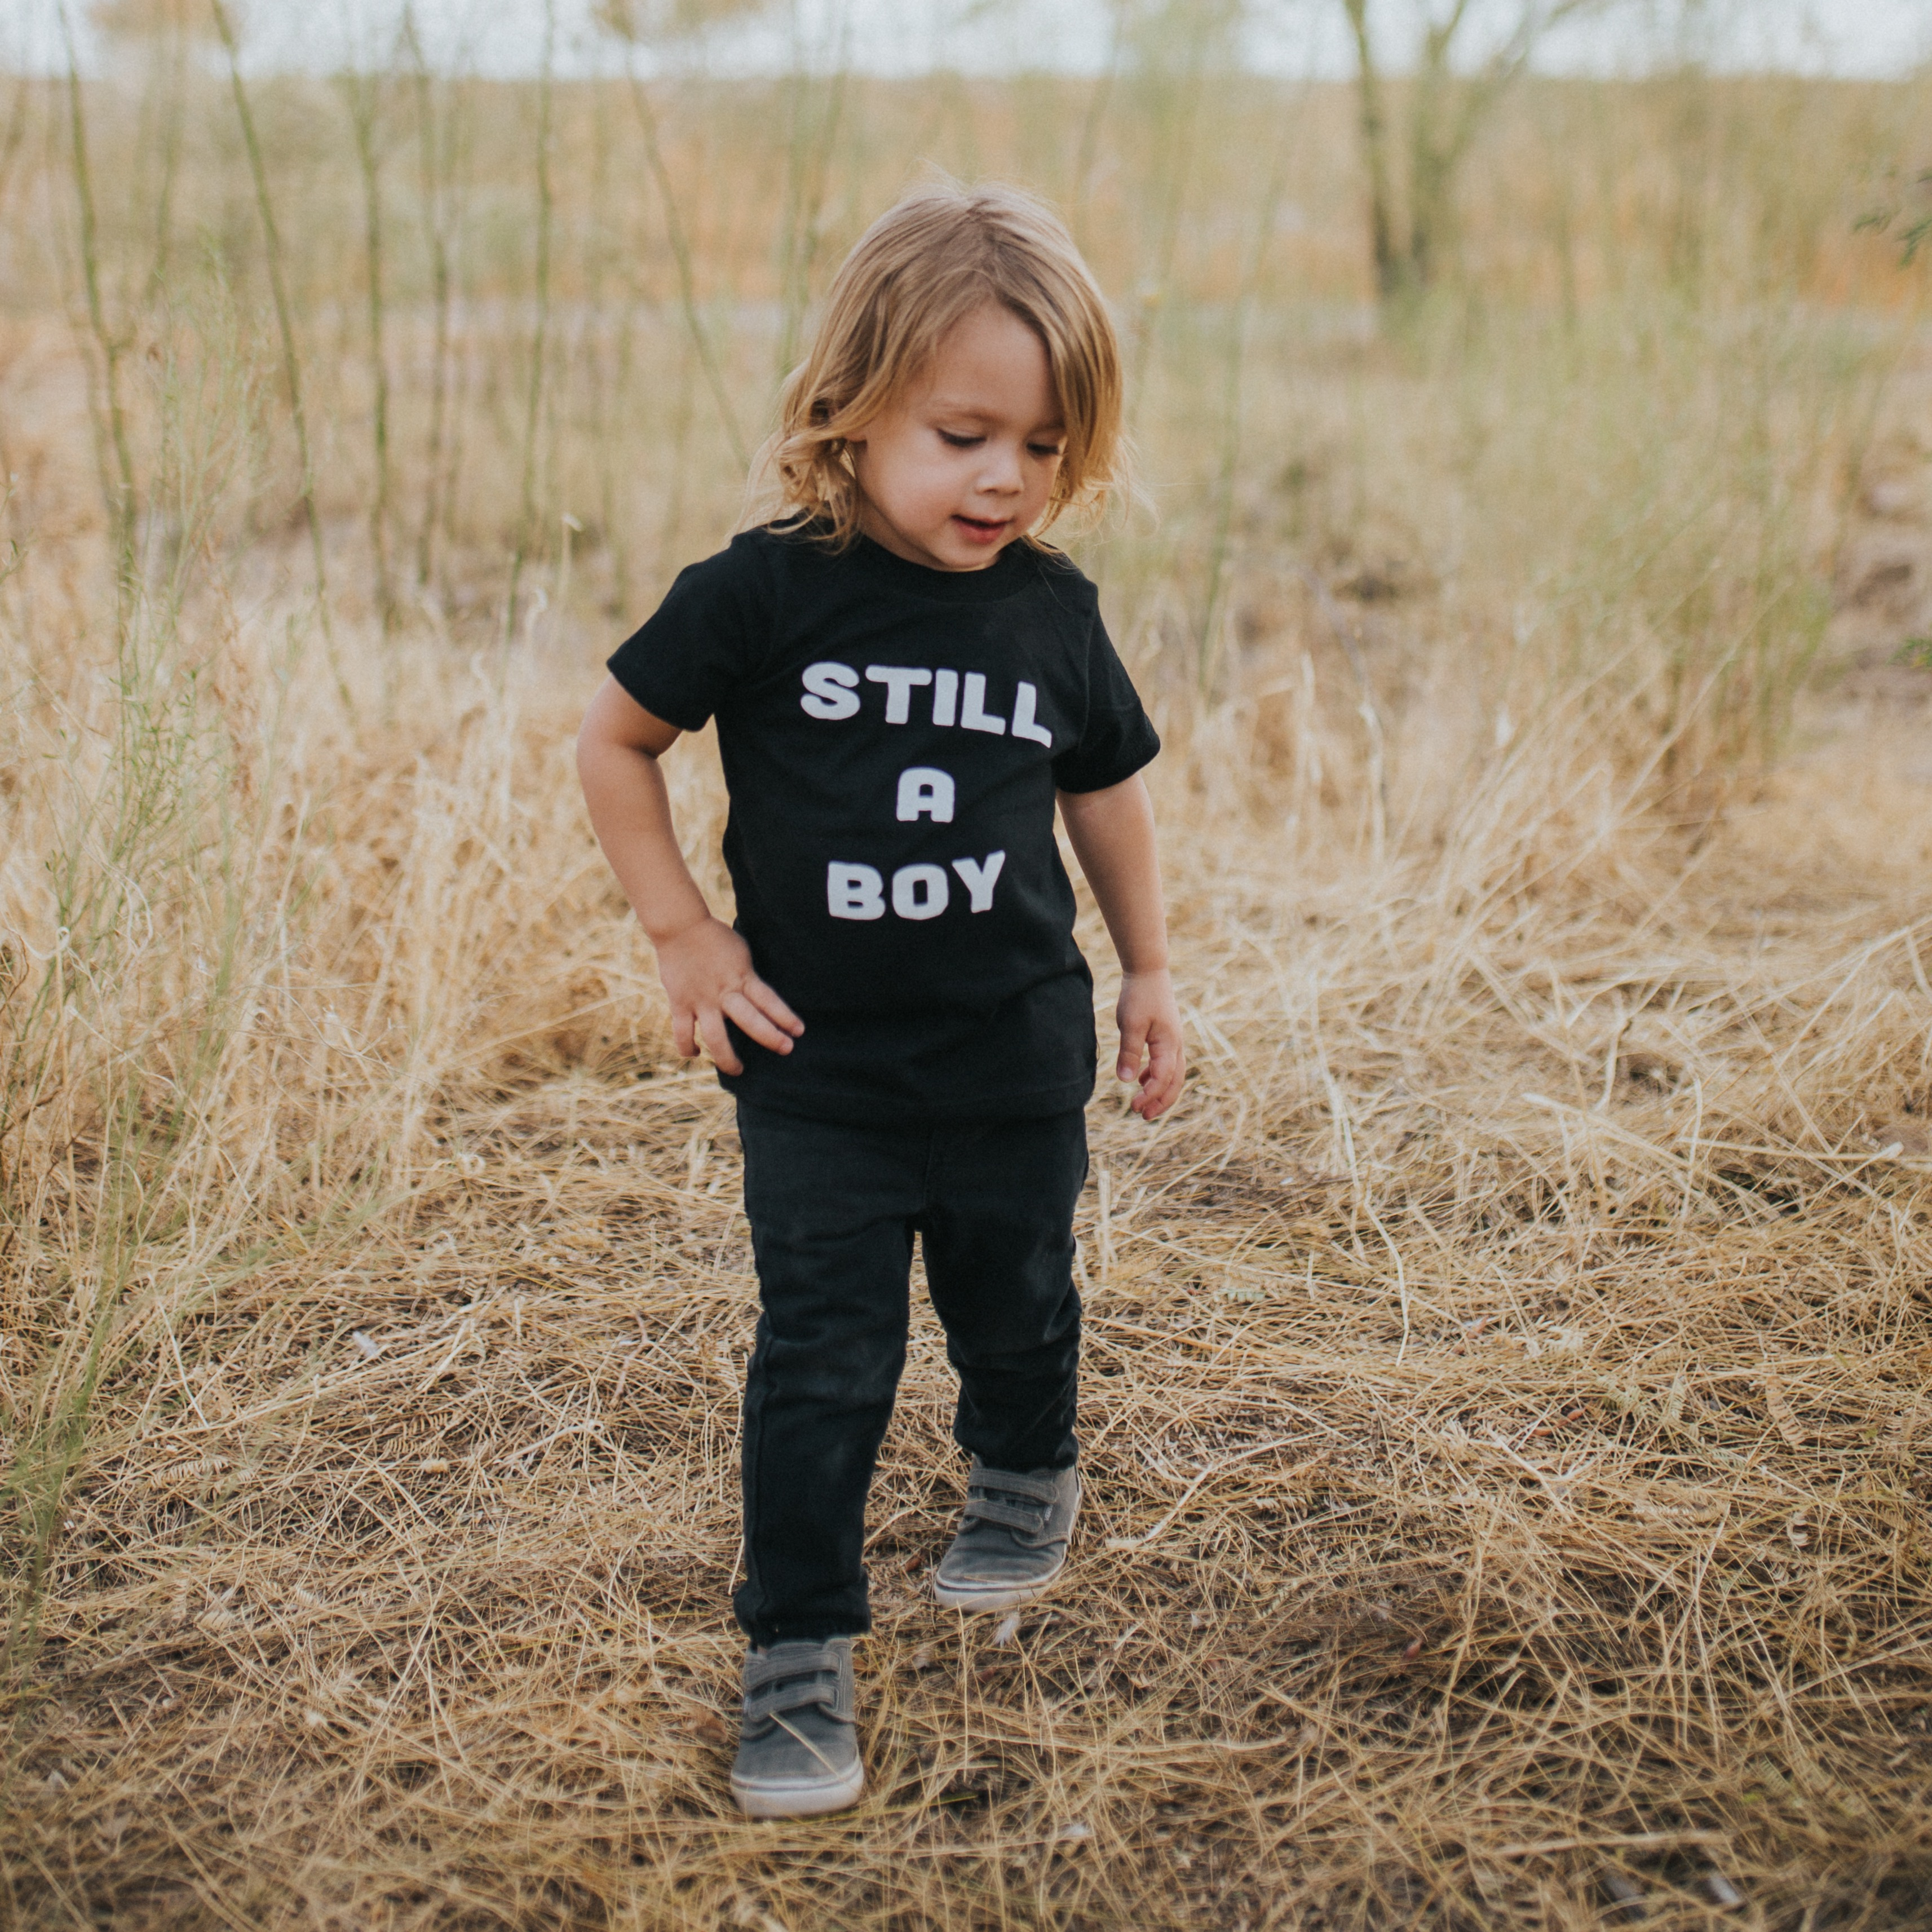 Still A Boy by Quirkie Kids